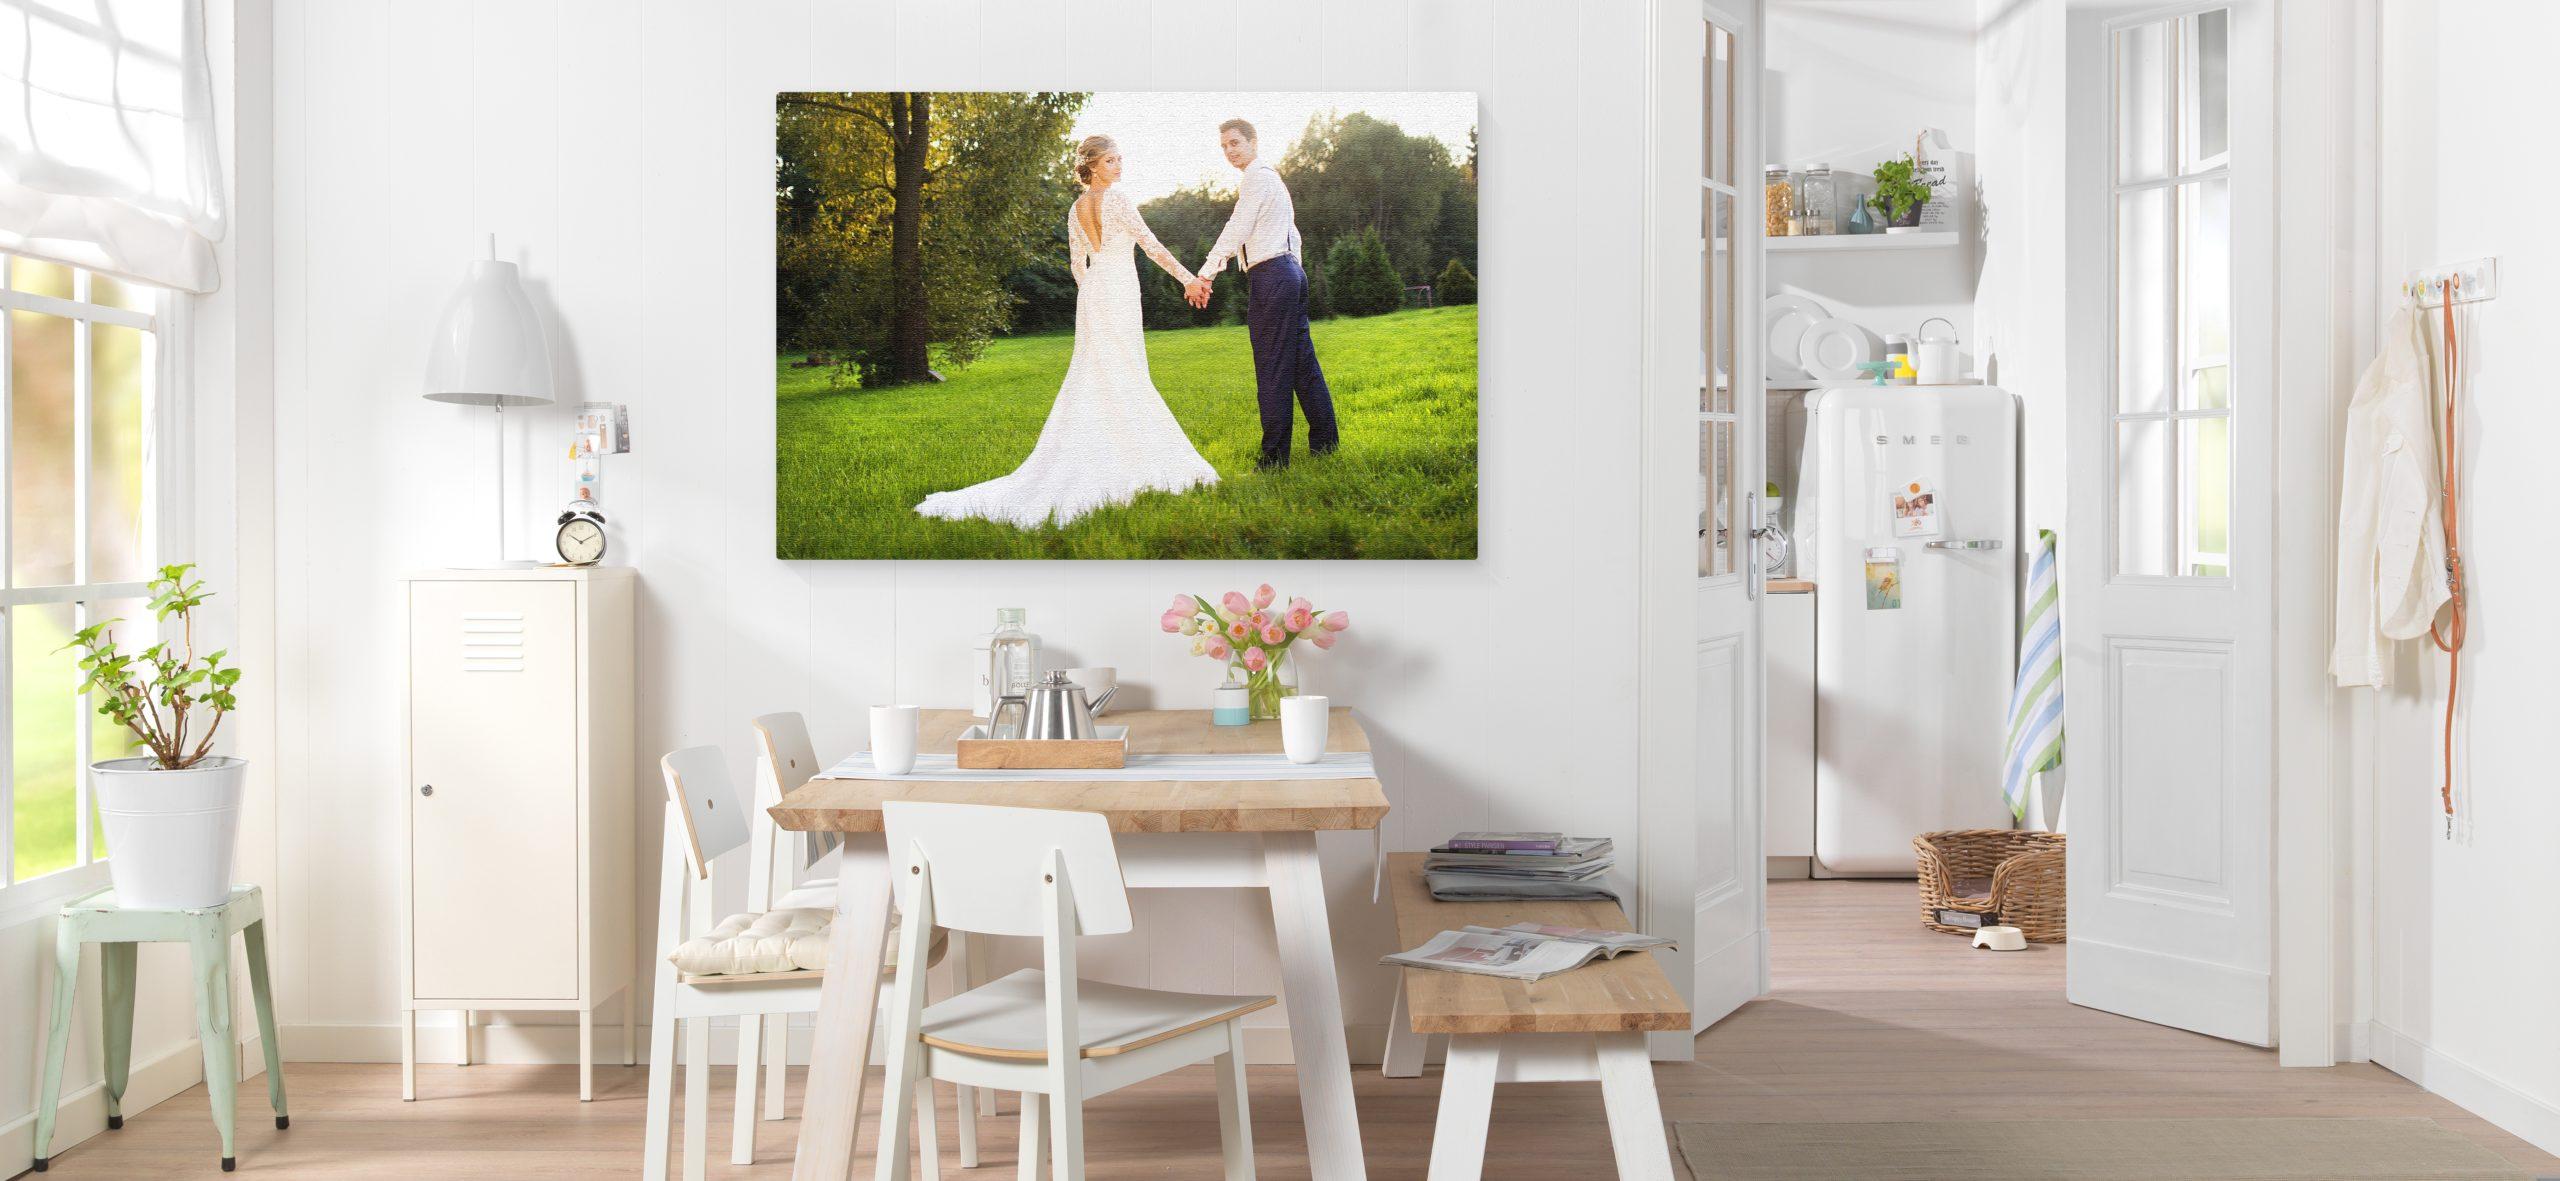 svatební, fotoobraz, svatba